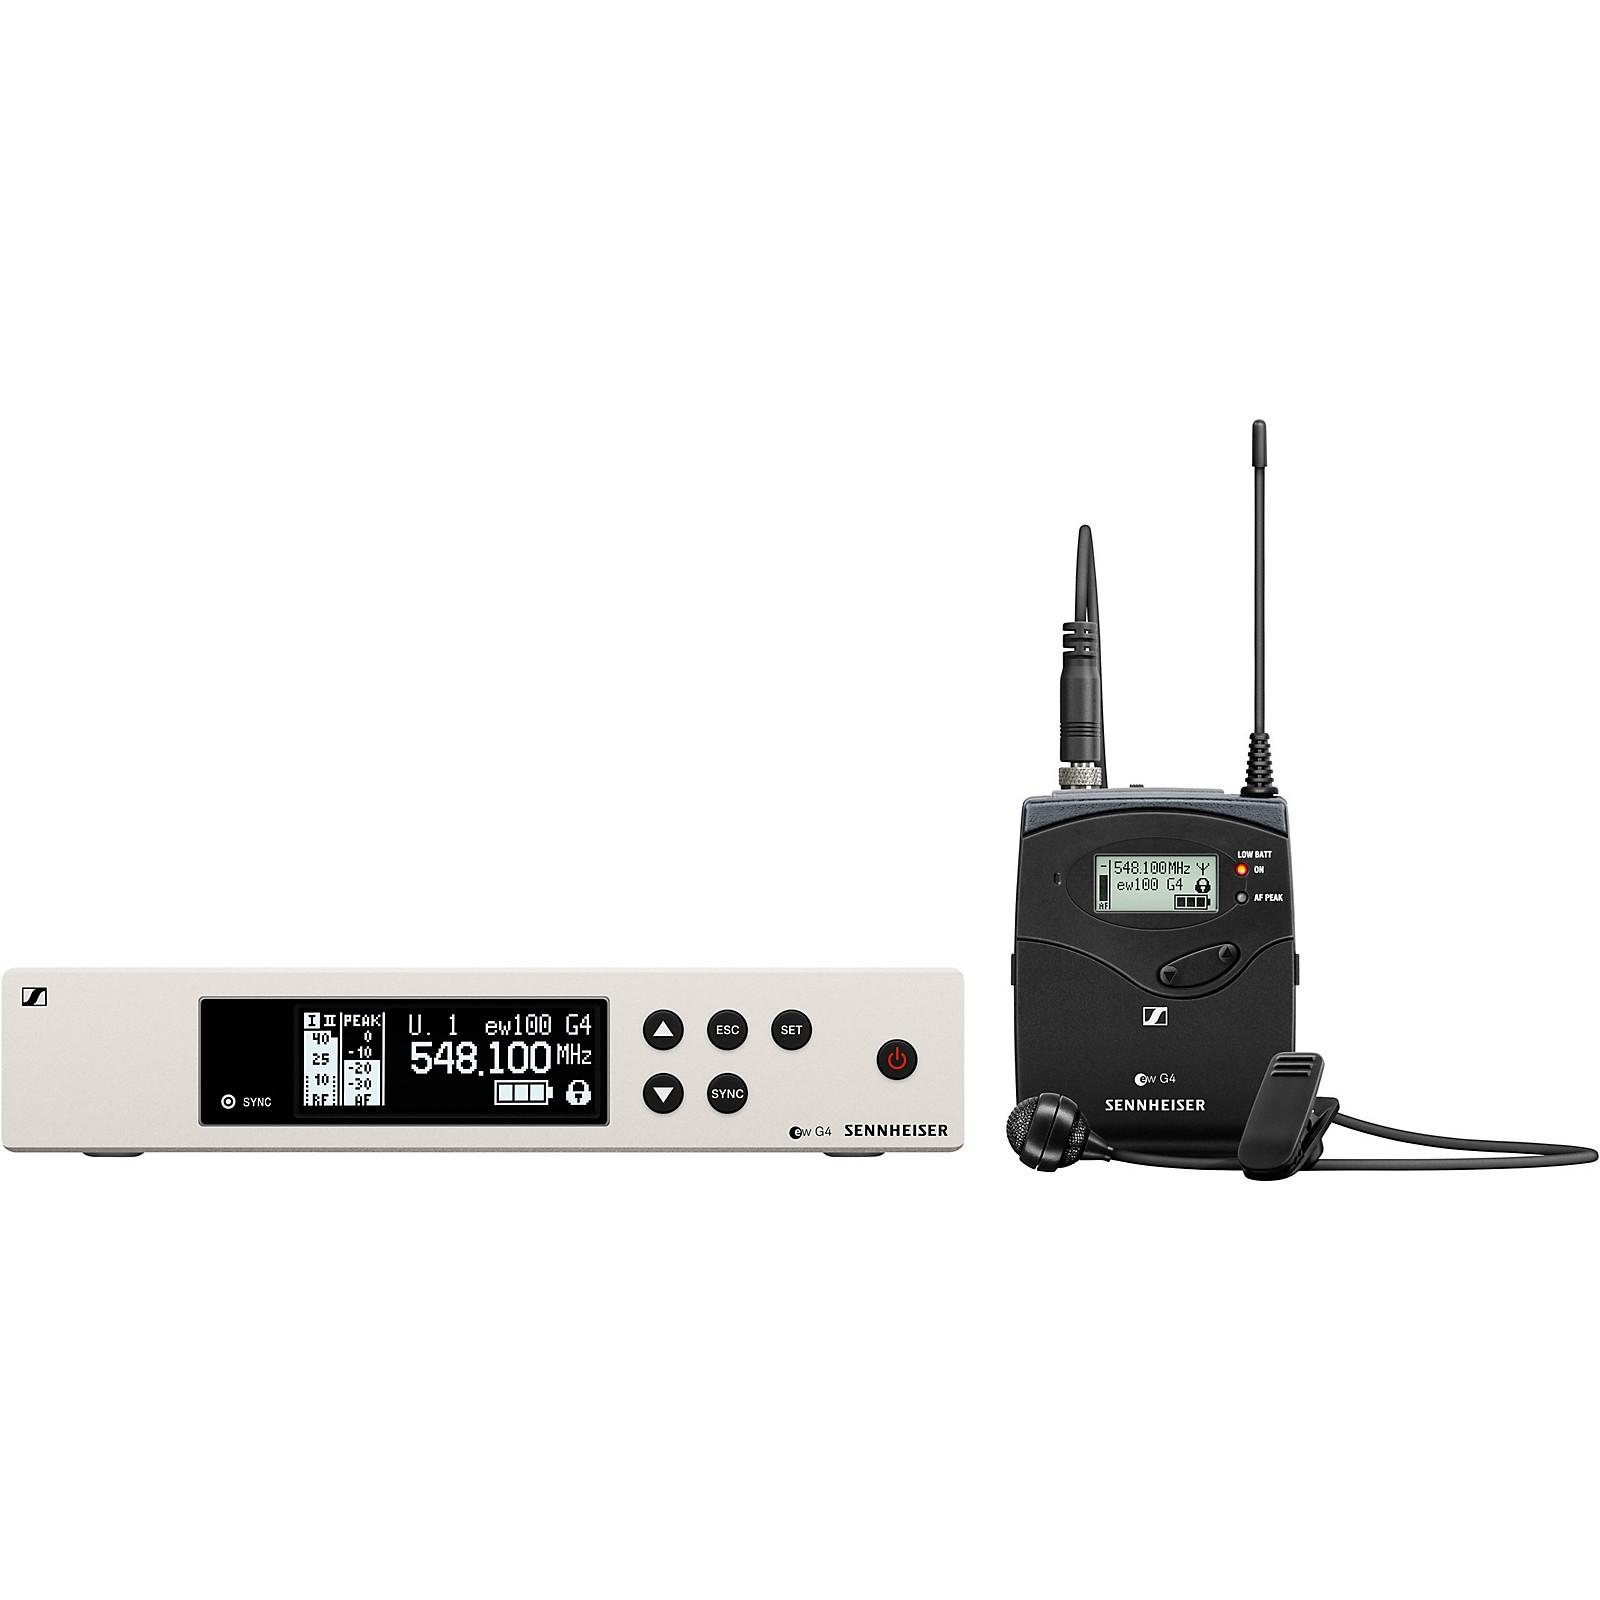 Sennheiser ew 100 G4 Lavalier Wireless System with ME2 Omnidirectional Lavalier Microphone